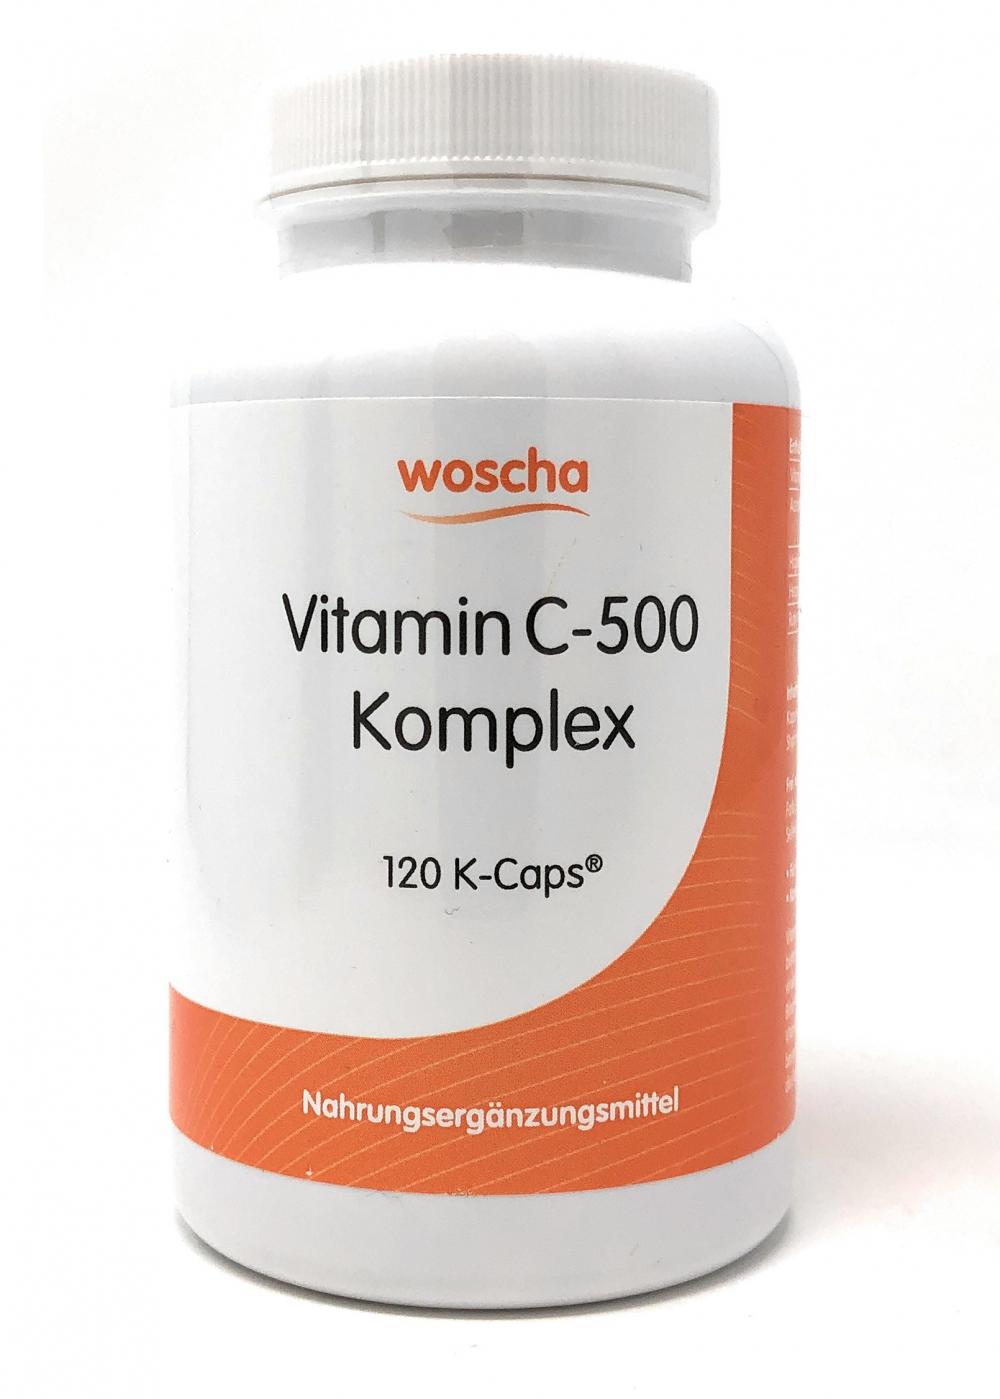 woscha Vitamin C-500 Komplex 120 K-Caps (104g) (vegan)